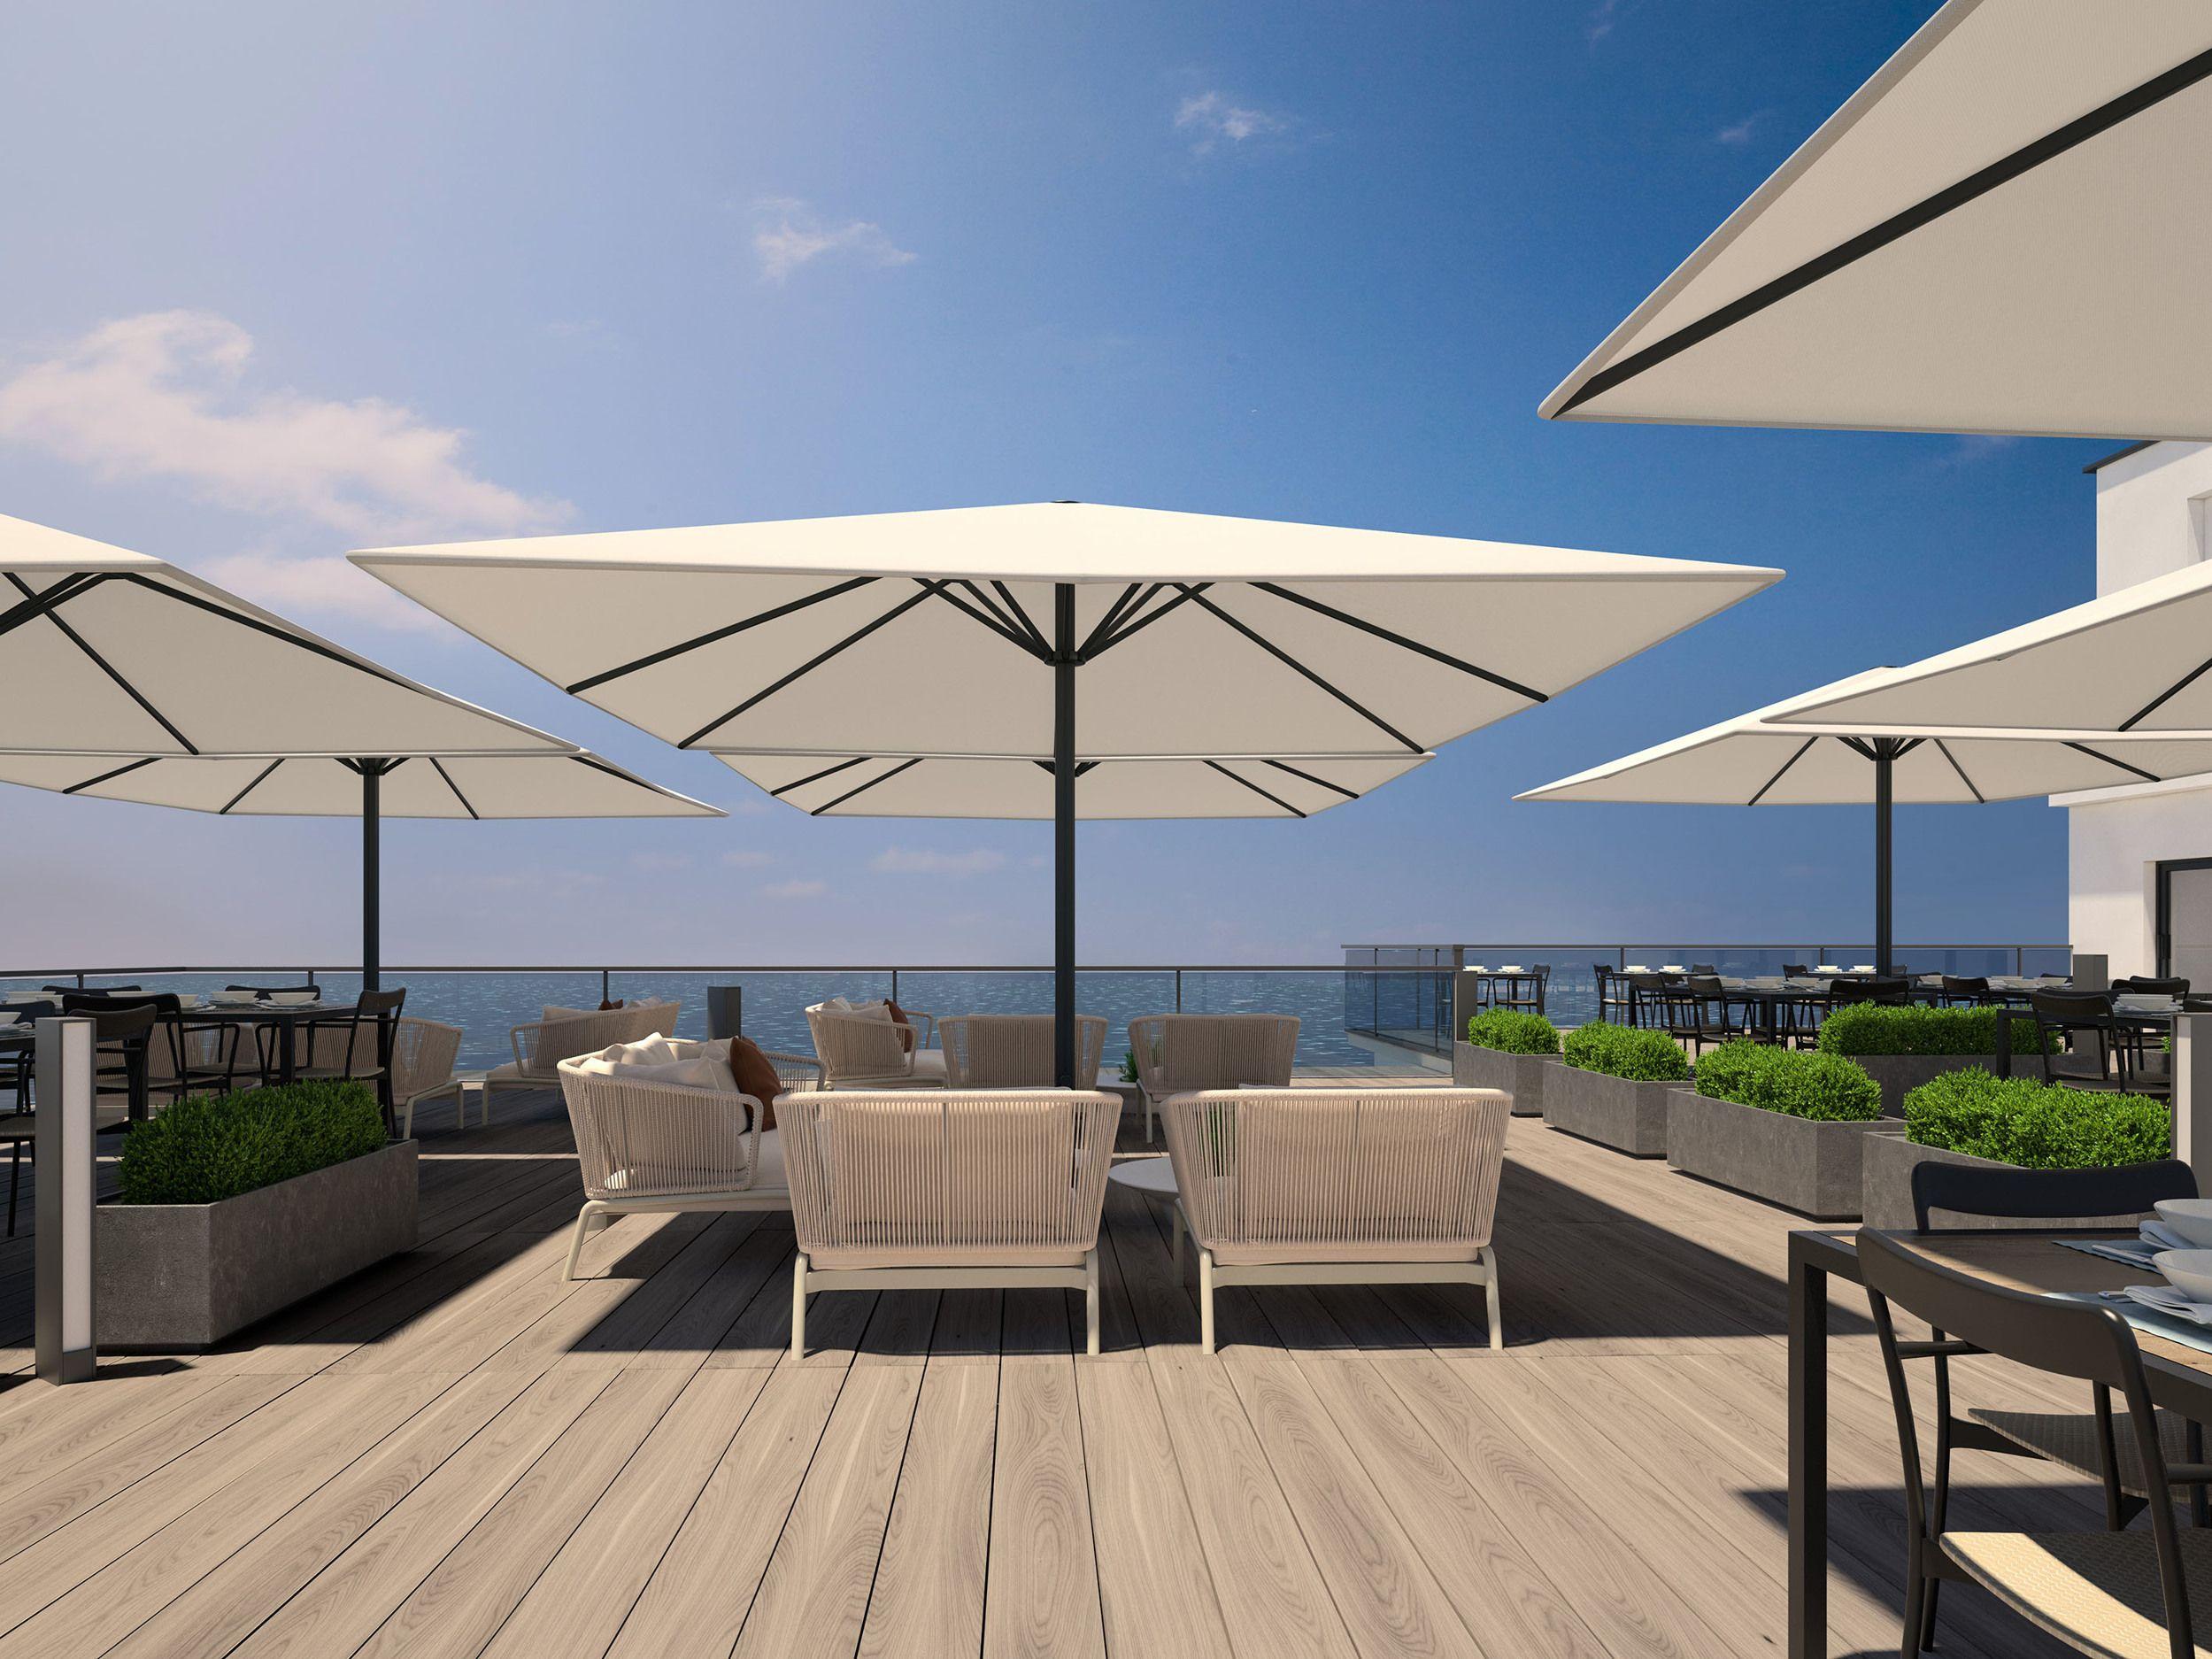 Hotel Umbrella Systems